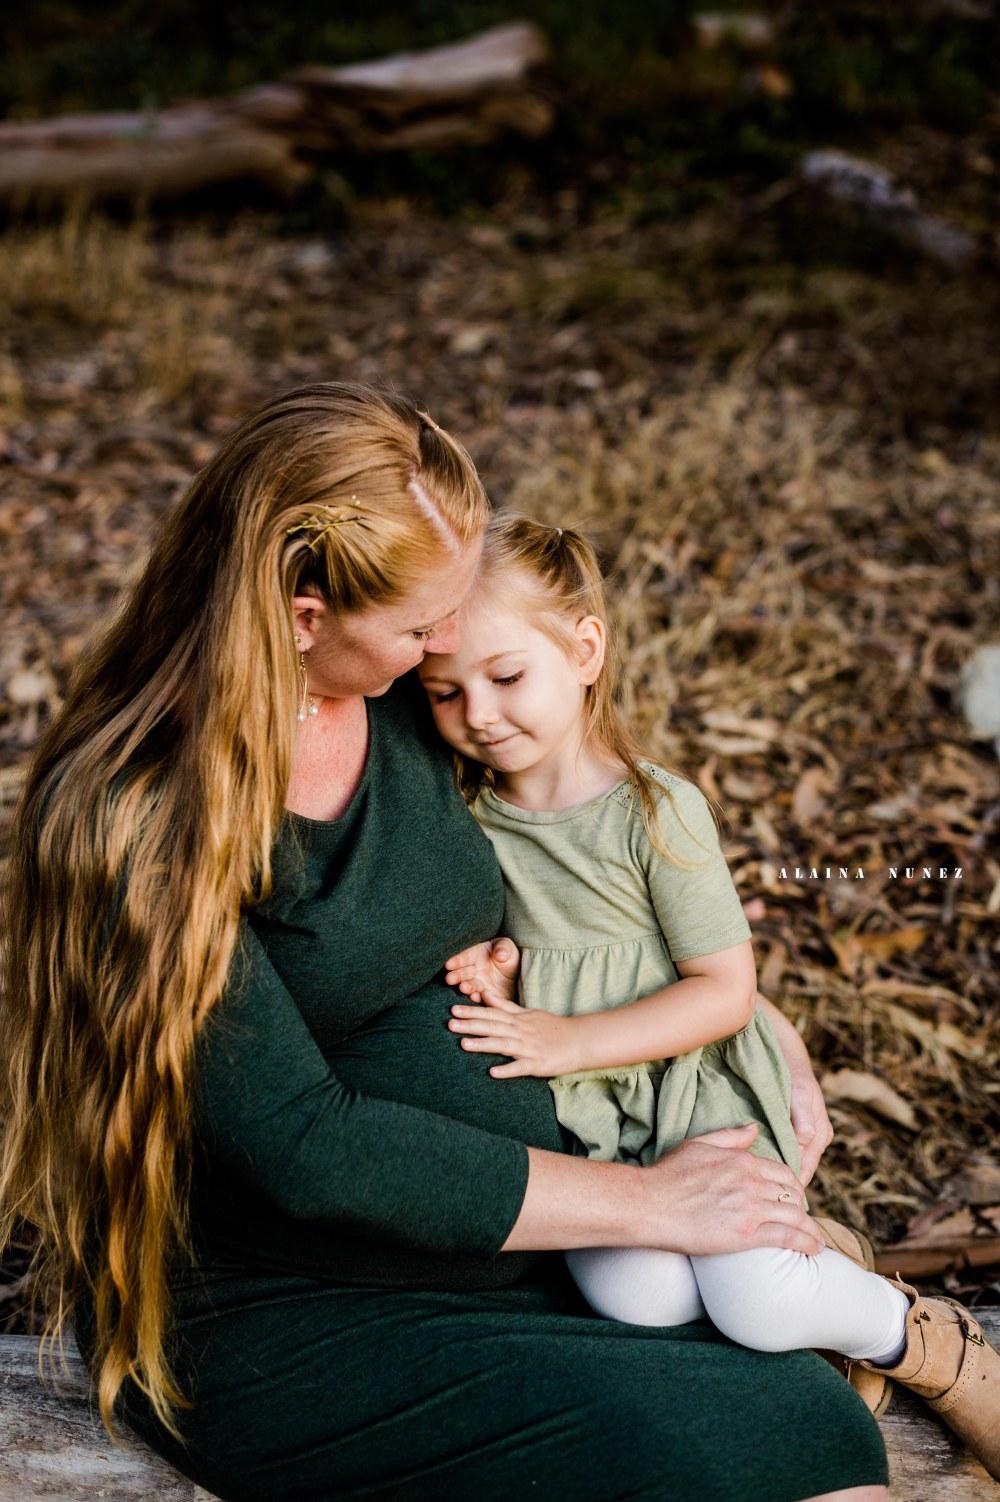 AlainaNunezPhotography.9-16-17-maternity.2